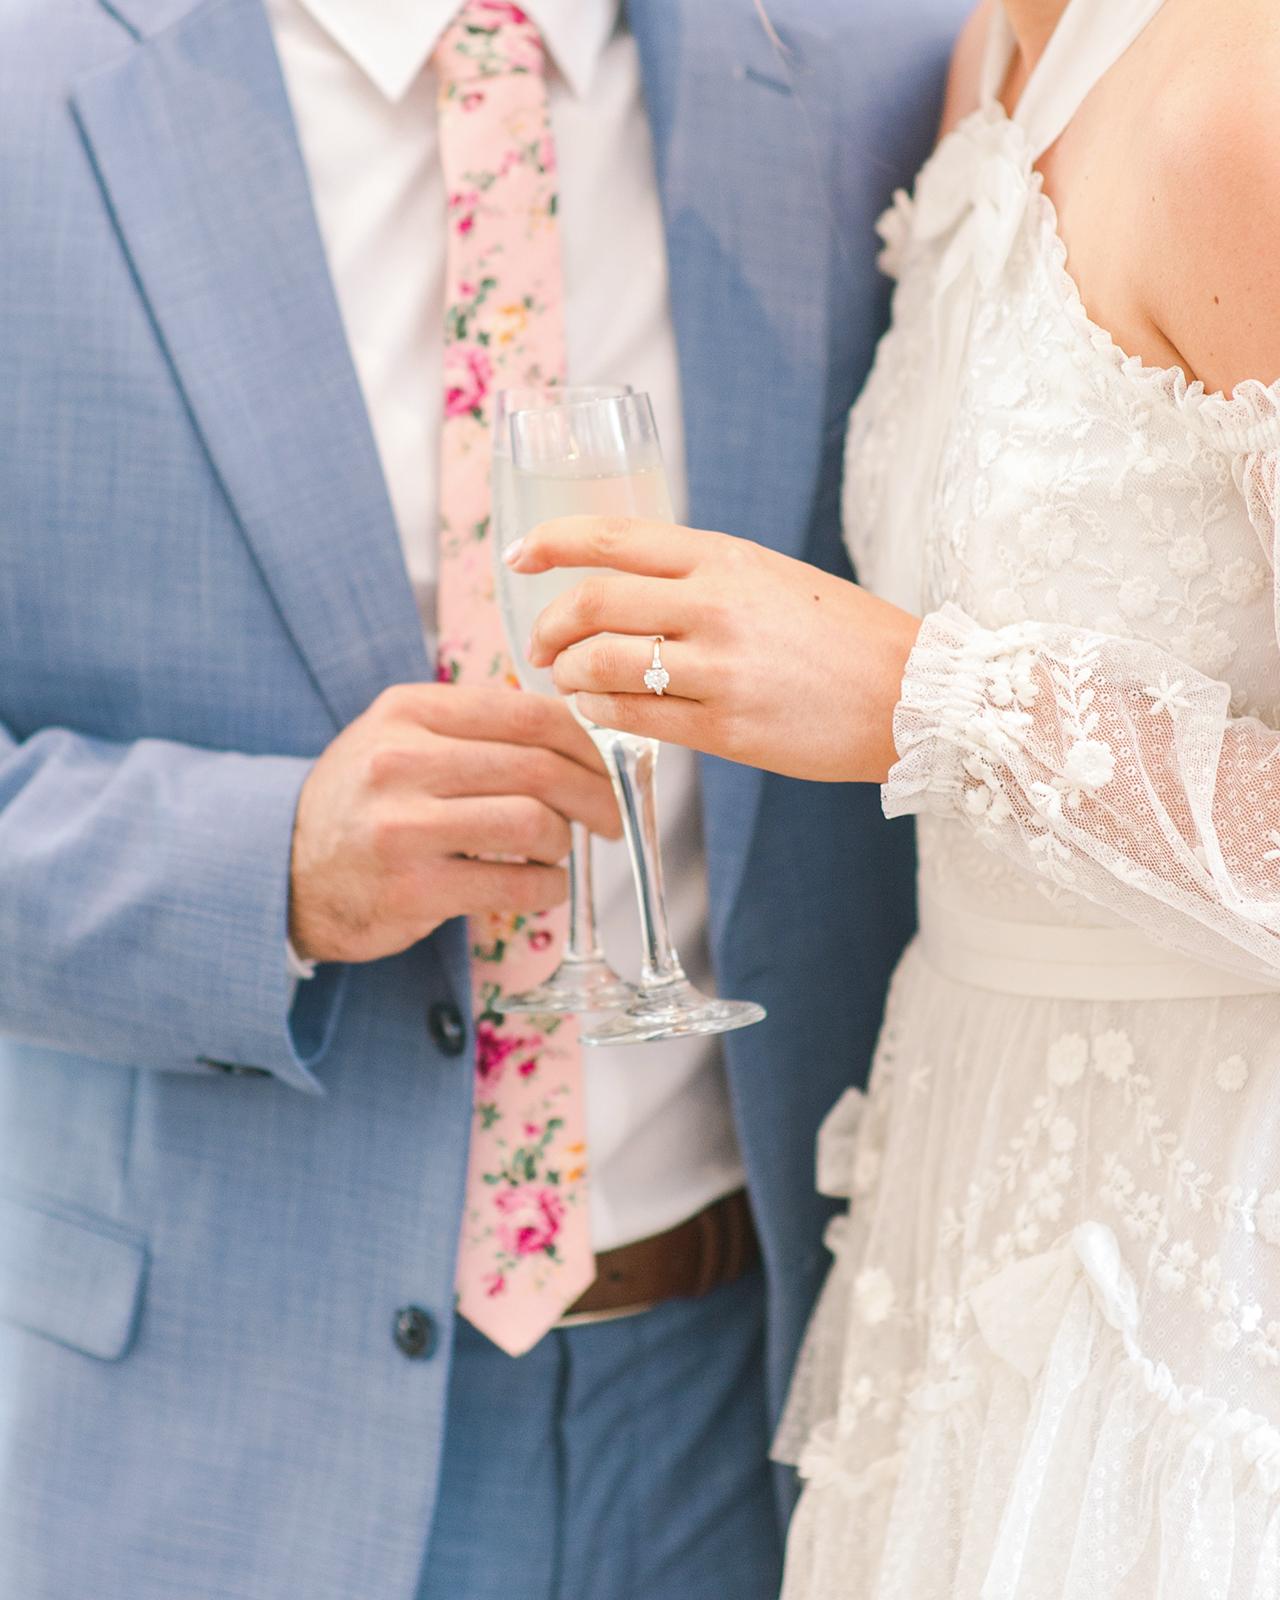 bride groom engagement ring wine glasses